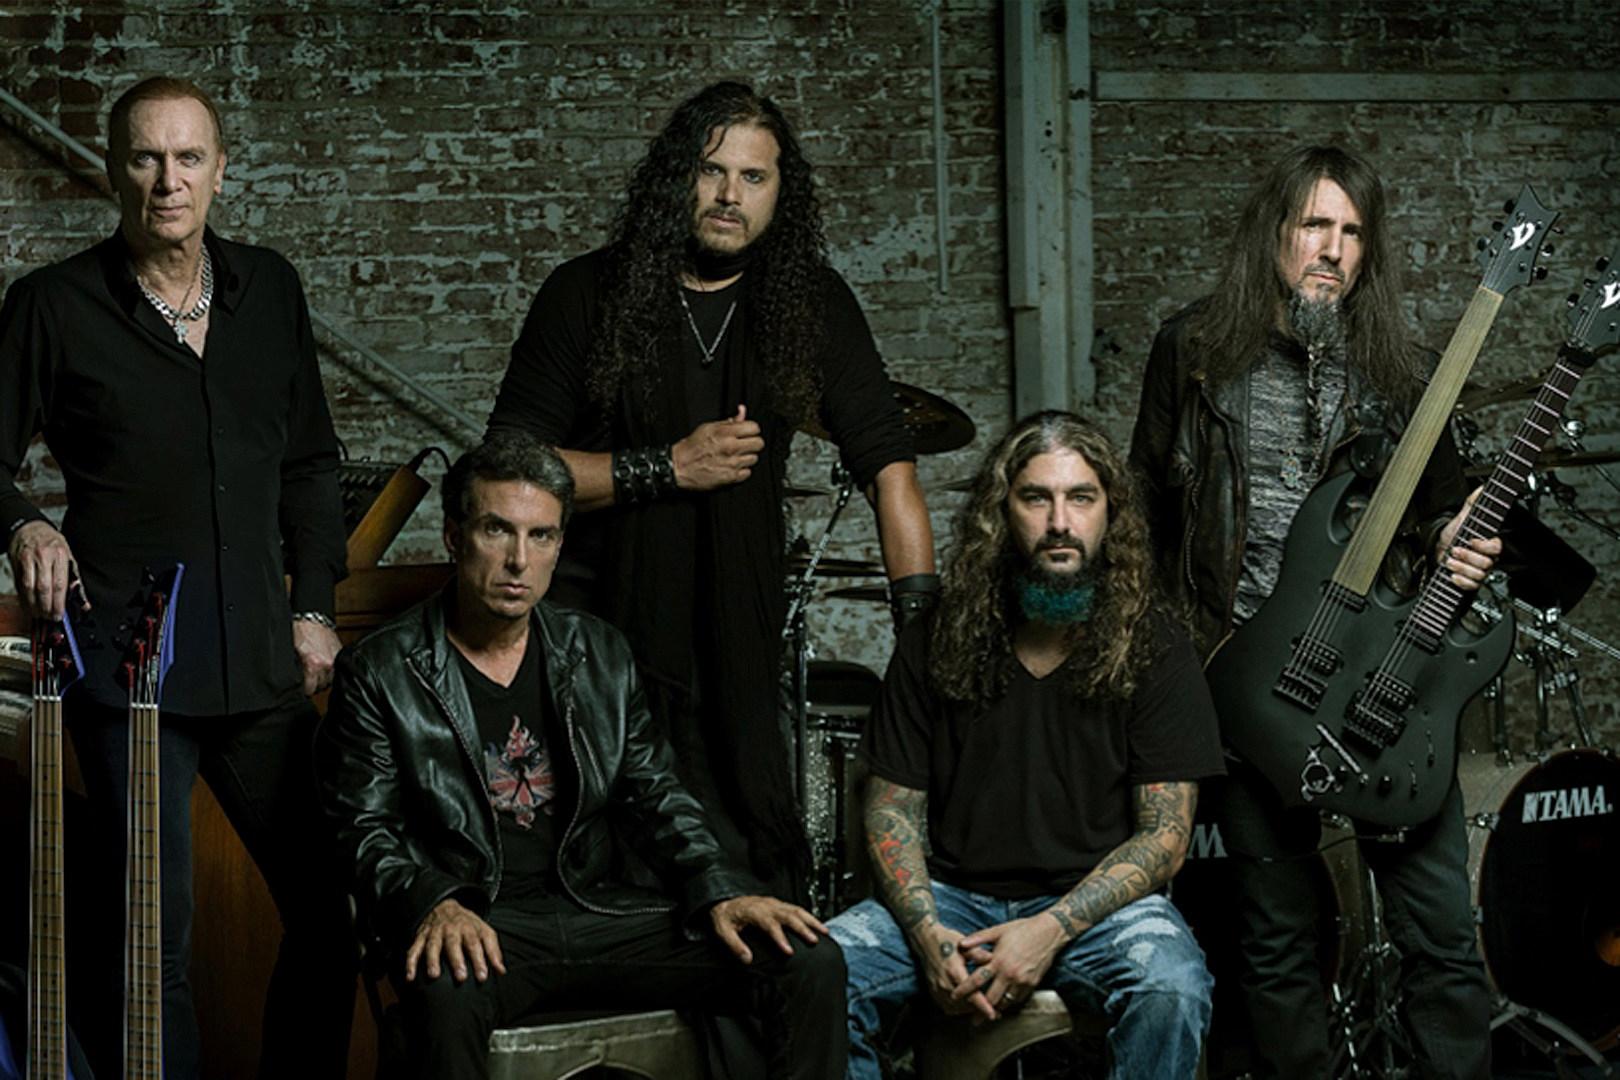 Sons of Apollo Announce 2020 Winter Tour Dates